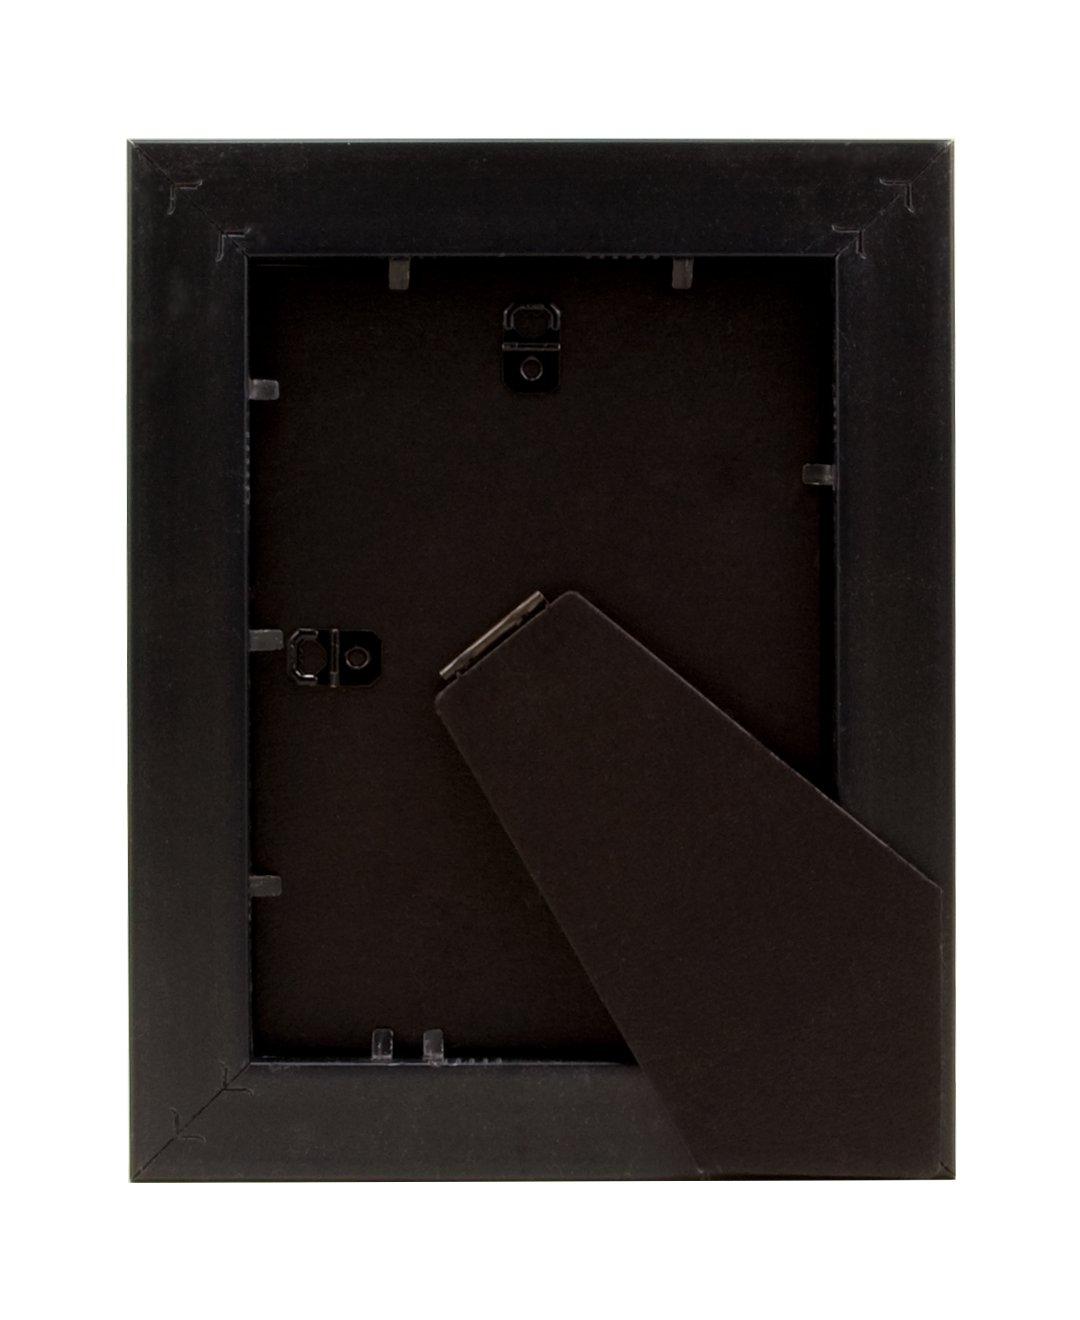 BorderTrends Noir 5x7-Inch Photo Frame Black